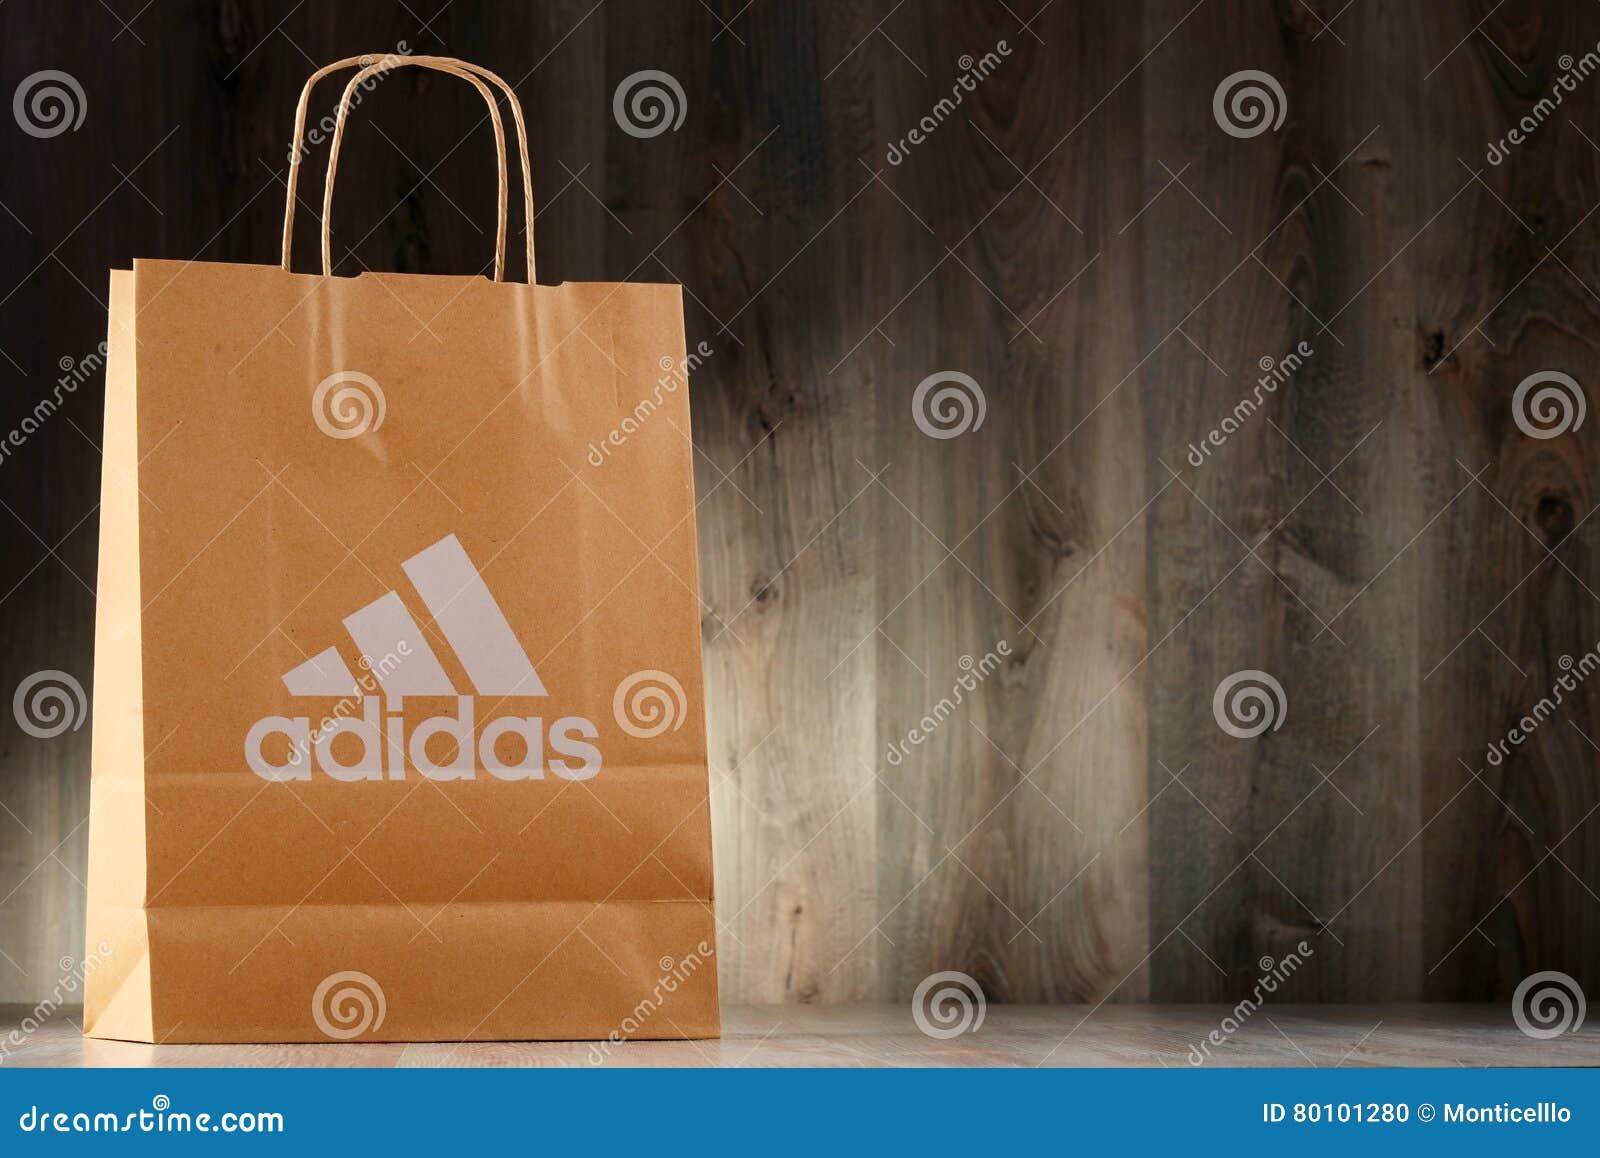 Original Adidas Paper Shopping Bag Editorial Image - Image of